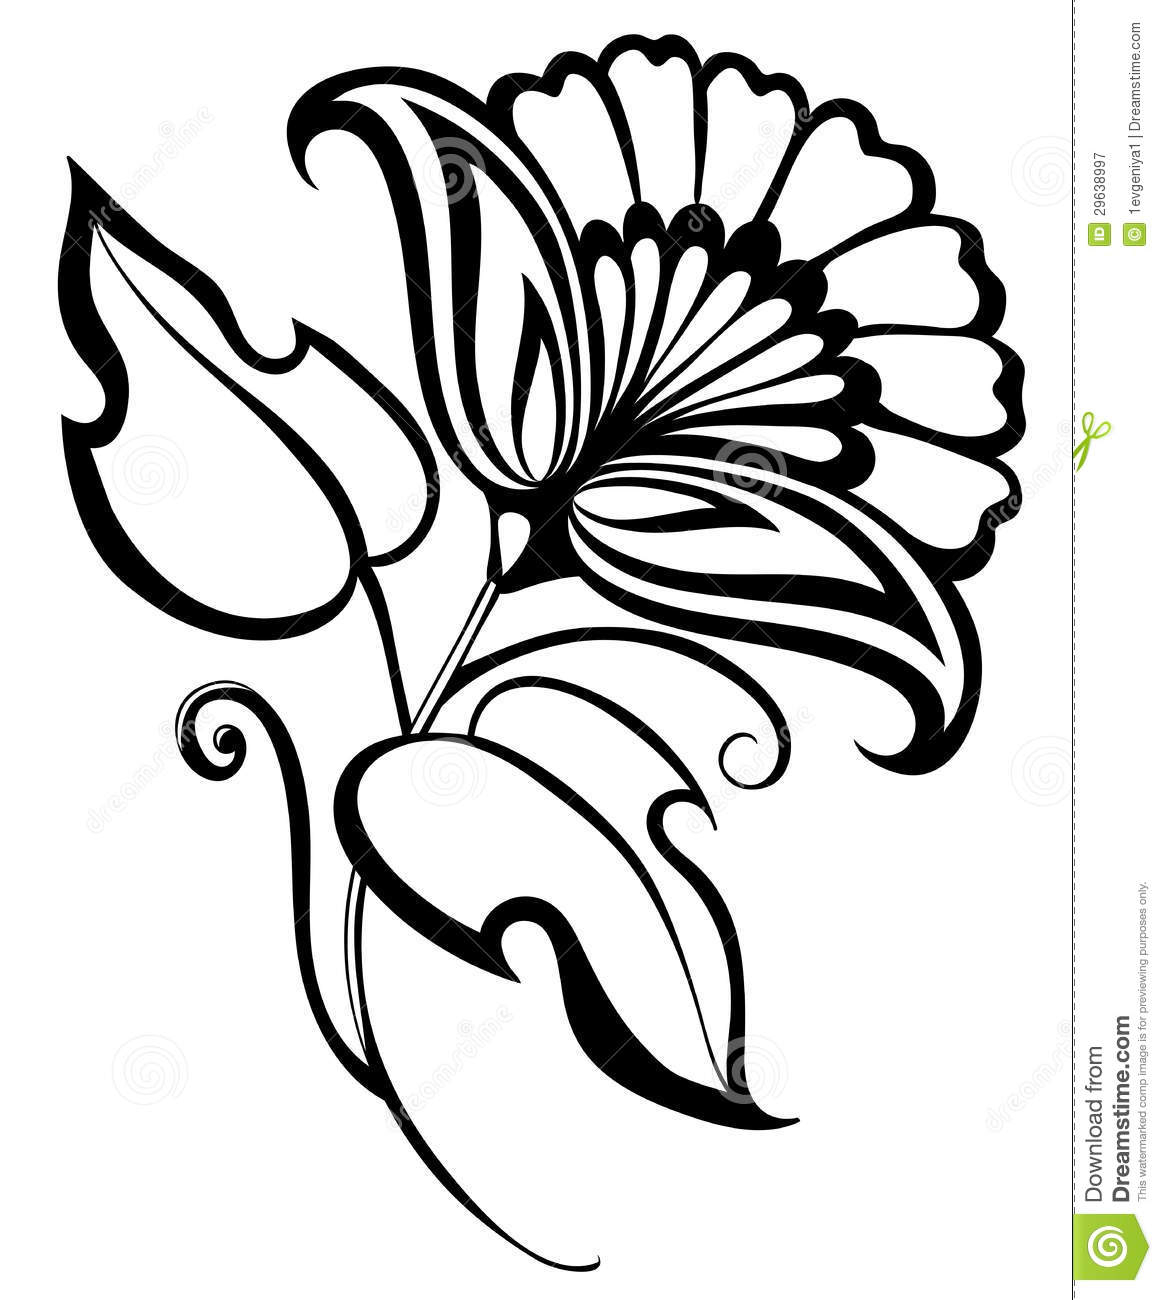 1162x1300 Pretty Designs Of Flowers To Draw